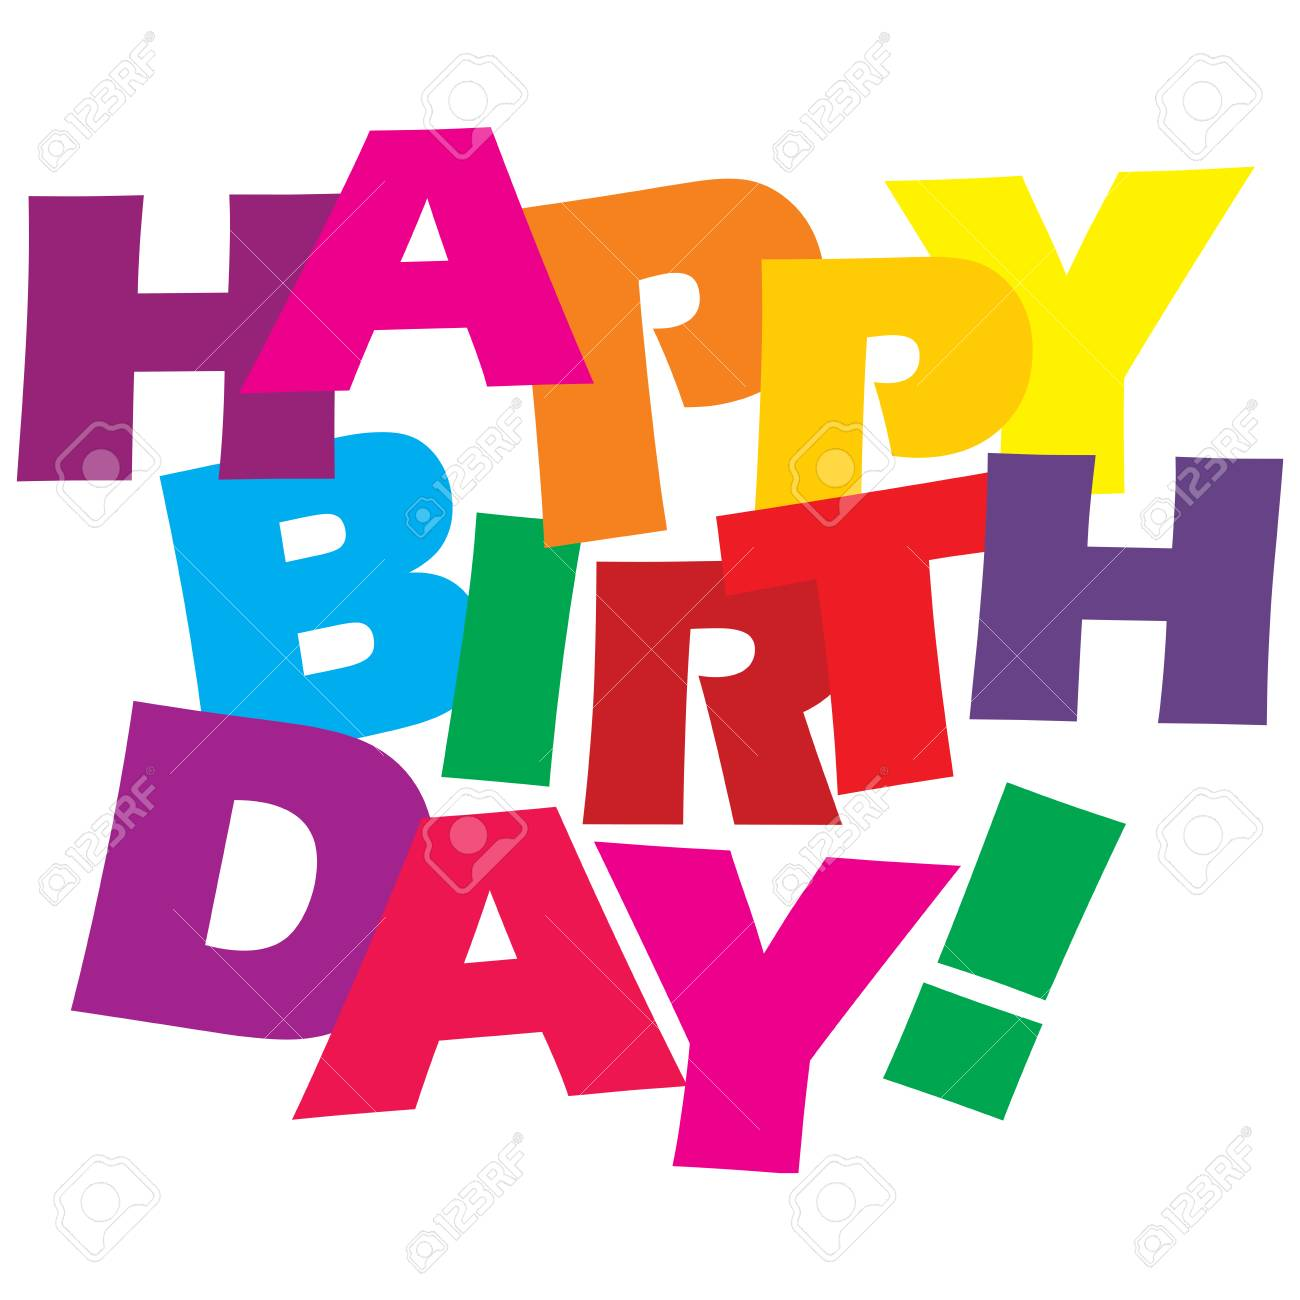 birthday colors Typographic Illustration Of Happy Birthday In Bright Happy Colors  birthday colors